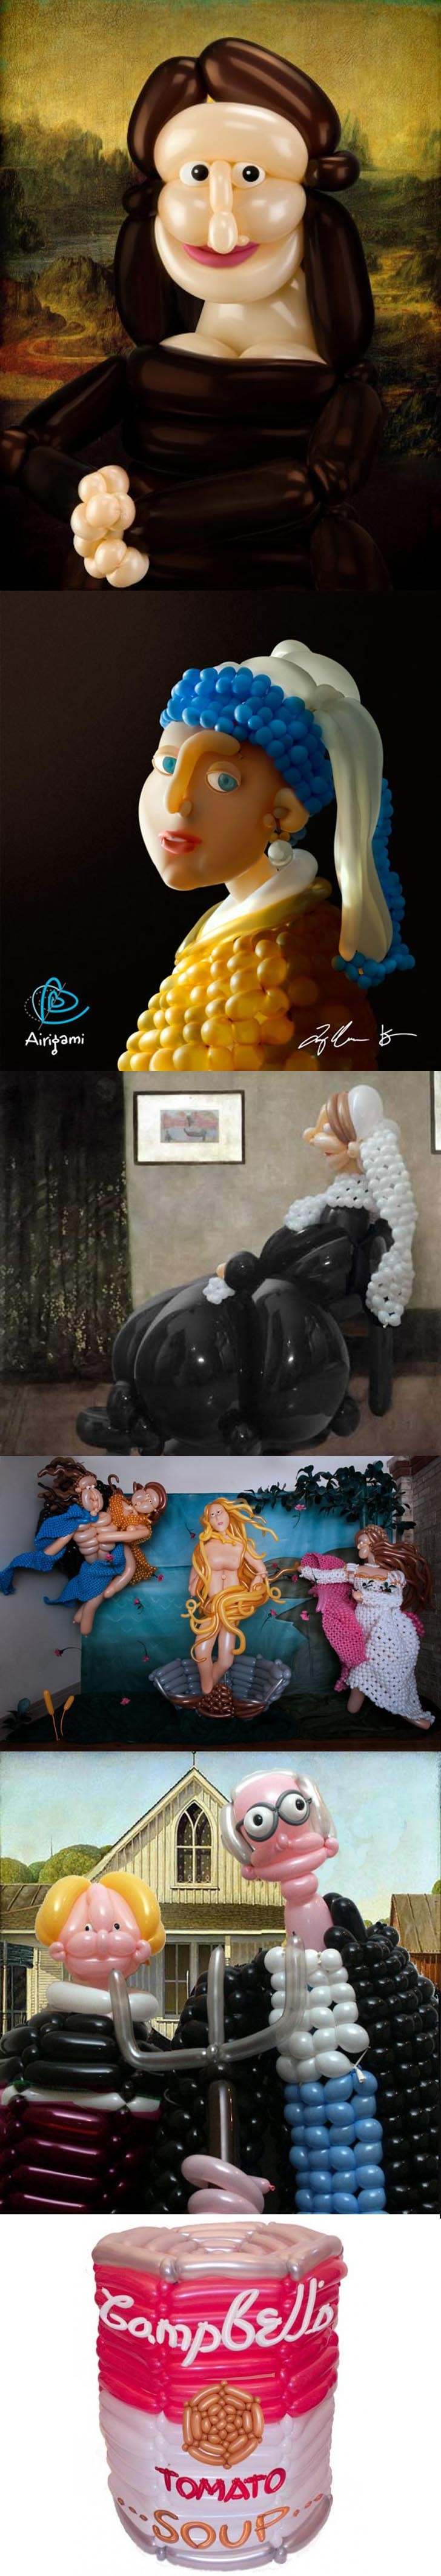 Balloon Sculpturing of Famous Art Pieces